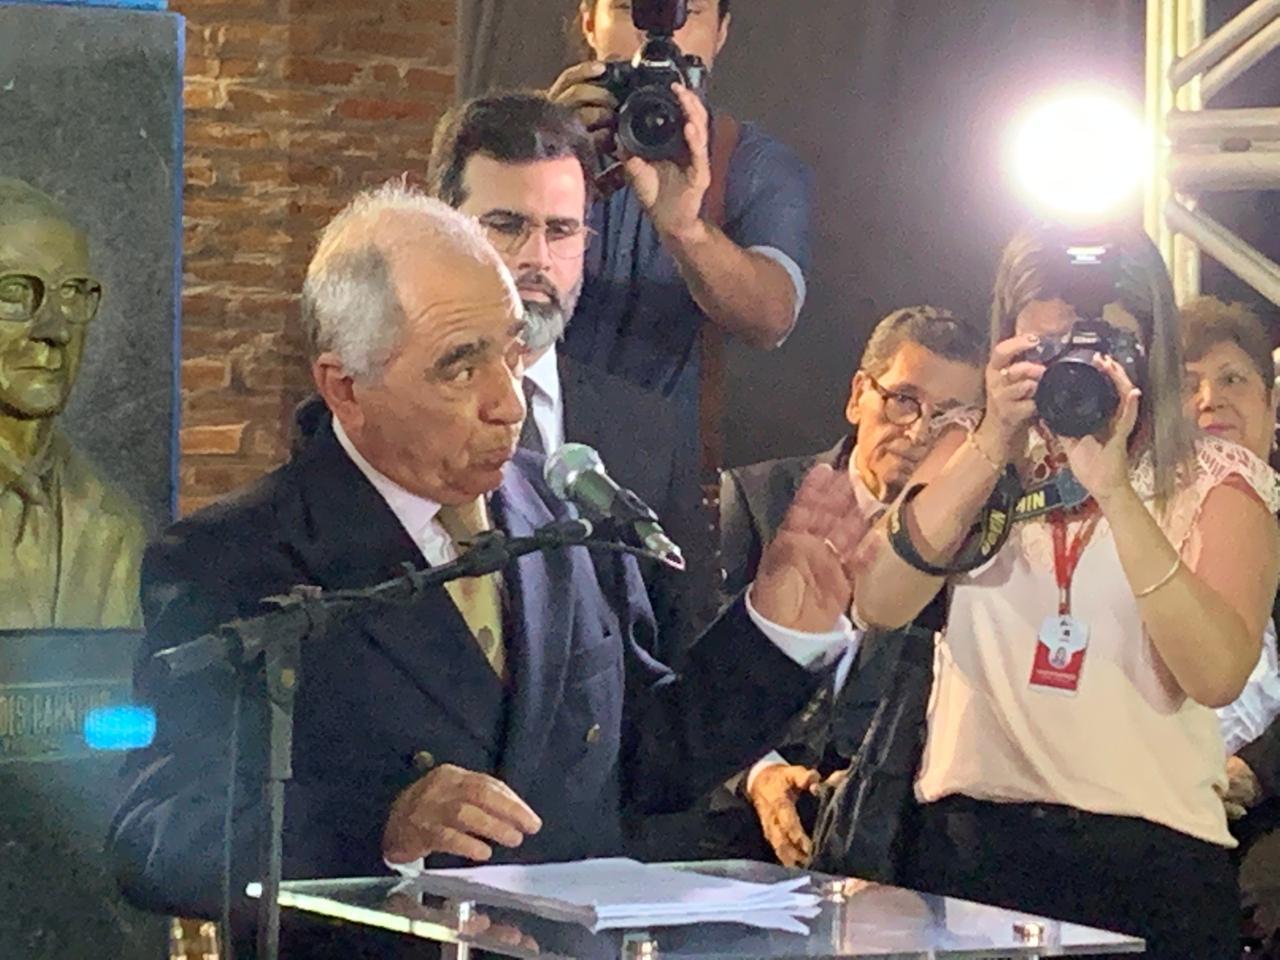 WhatsApp Image 2019 08 23 at 20.10.16 - Roberto Cavalcanti é empossado na Academia paraibana de letras- VEJA VÍDEO